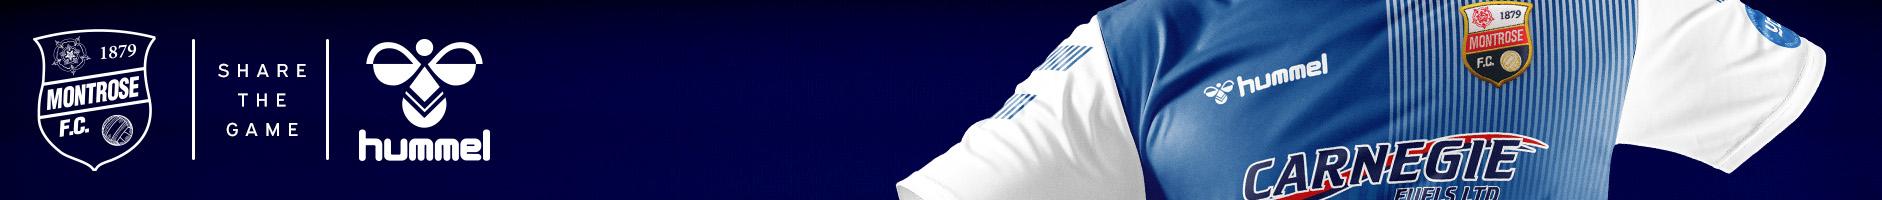 Montrose x Hummel | FN Teamwear